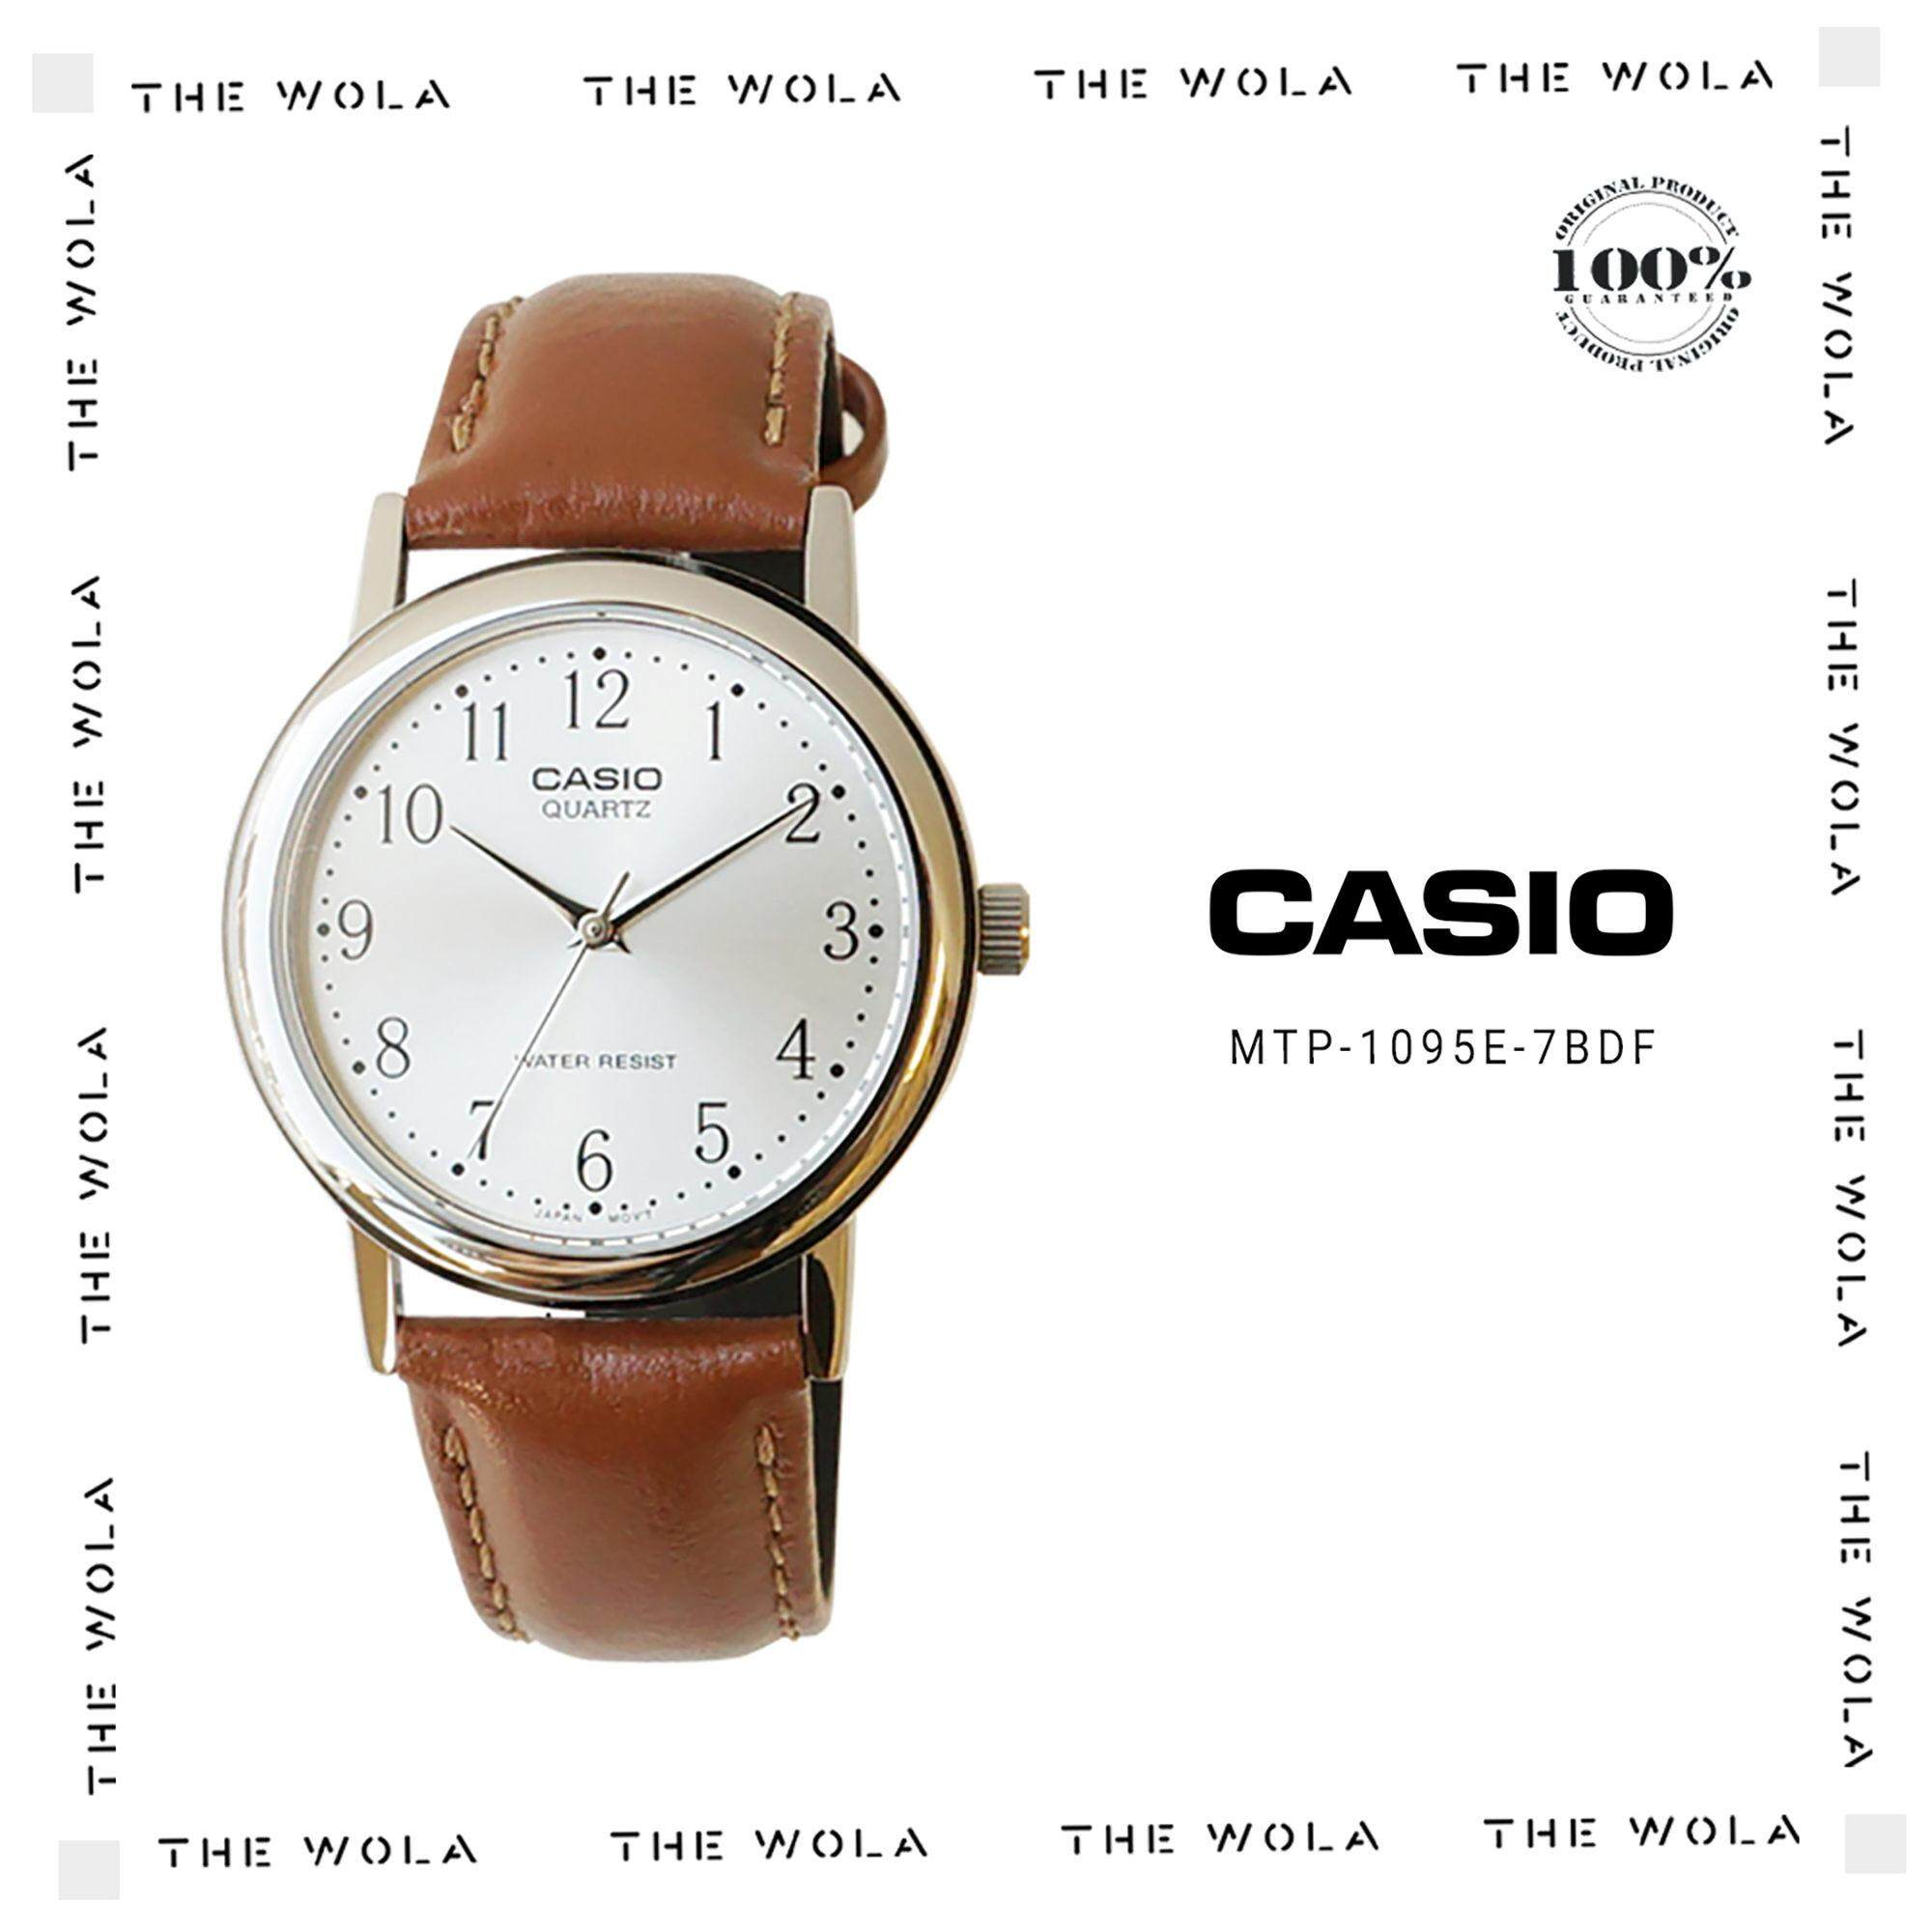 Casio Men Watches Price In Malaysia Best Lazada Standard Mtp V004d 1b Jam Tangan Pria Silver Strap Stainless Steel Casual Watch 1095e 7bdf Original Genuine 1 Year Warranty